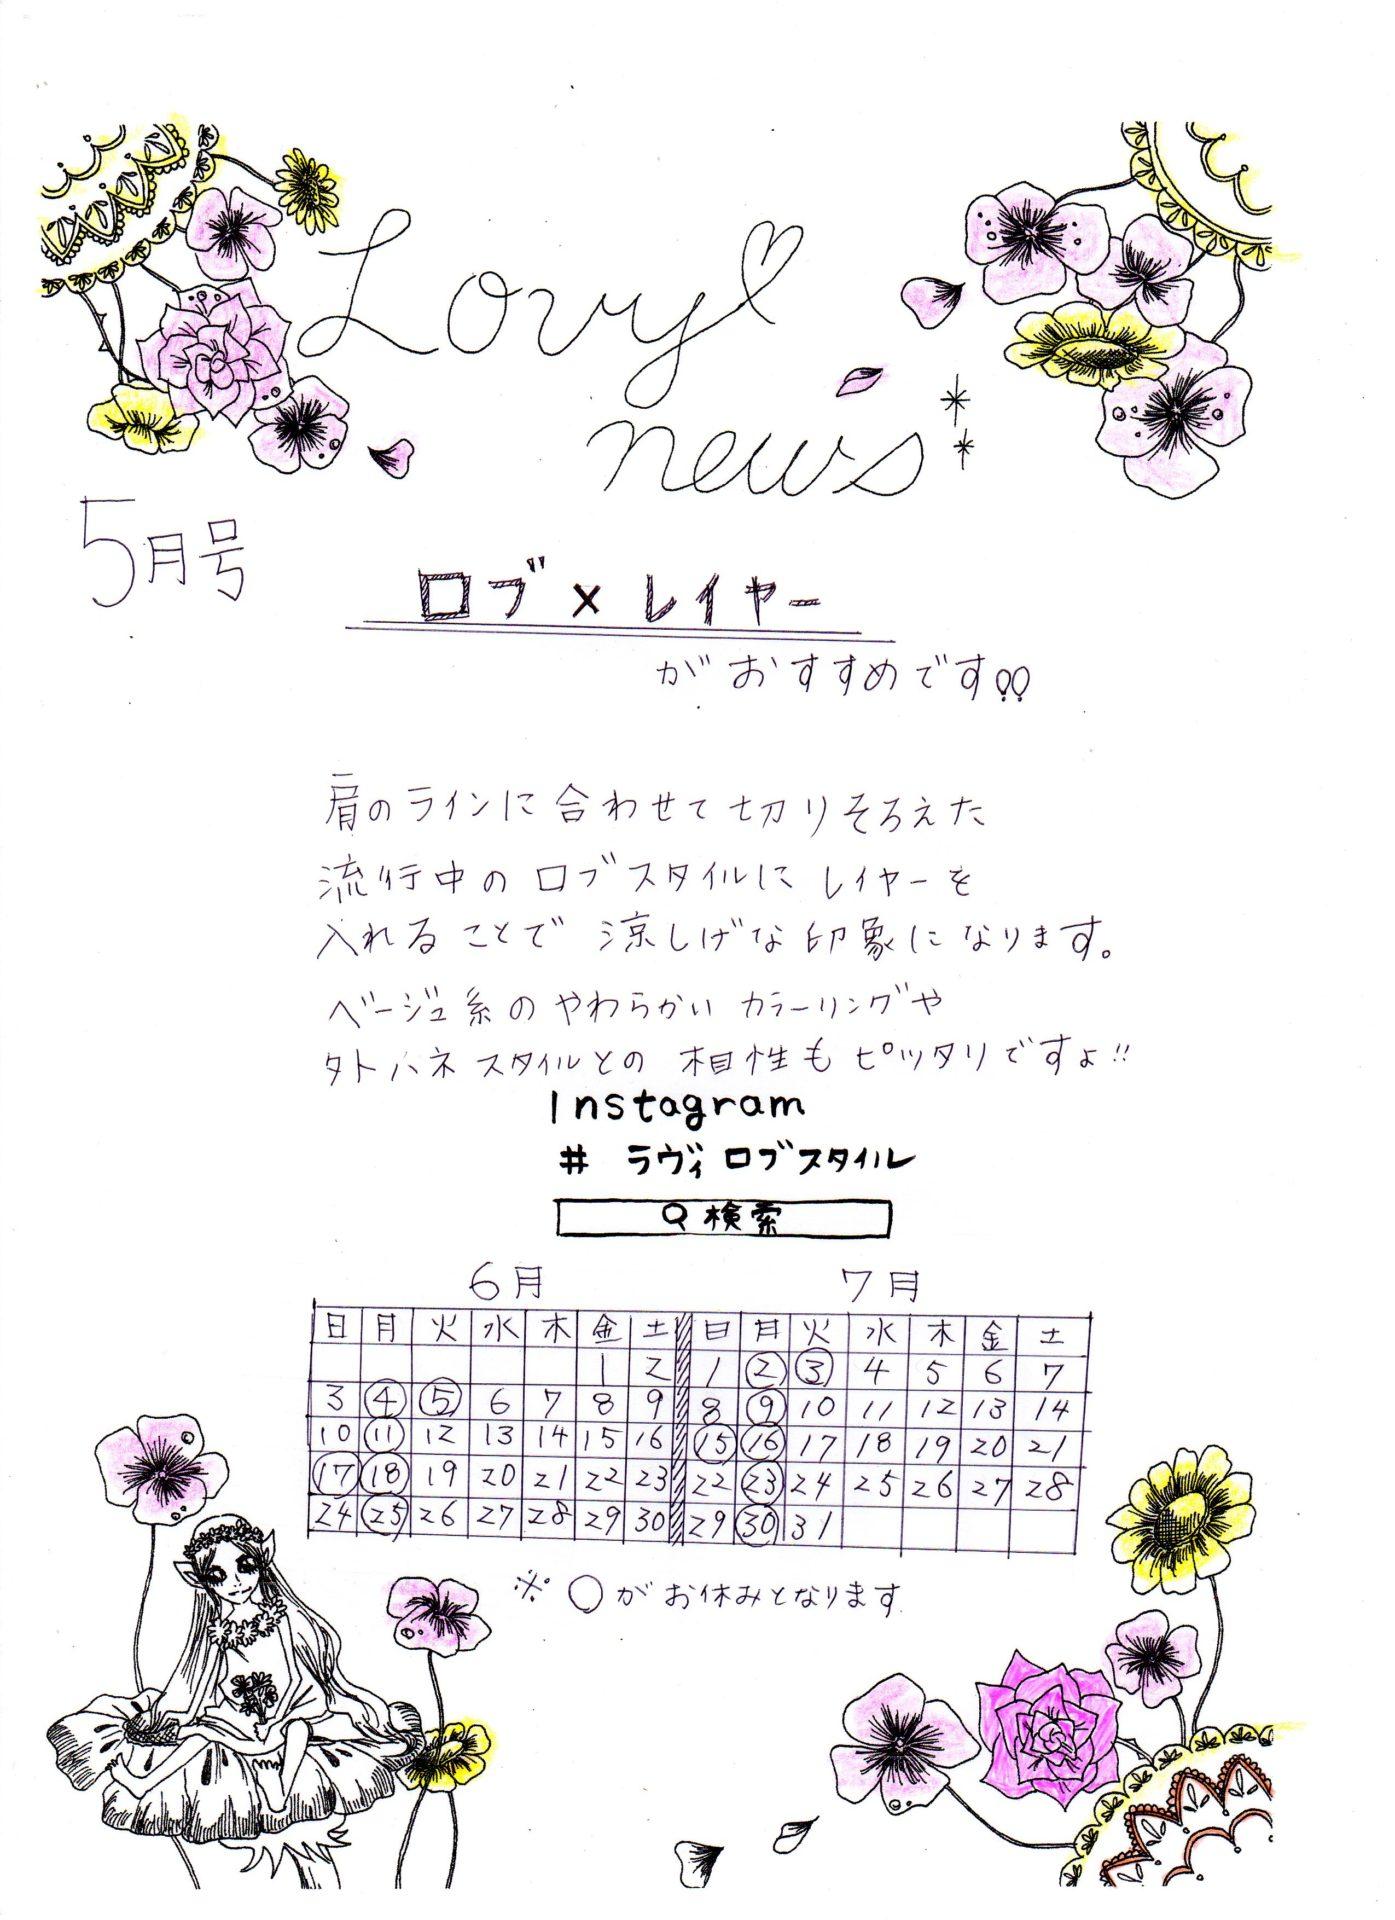 Lovy新聞 2018/5月号